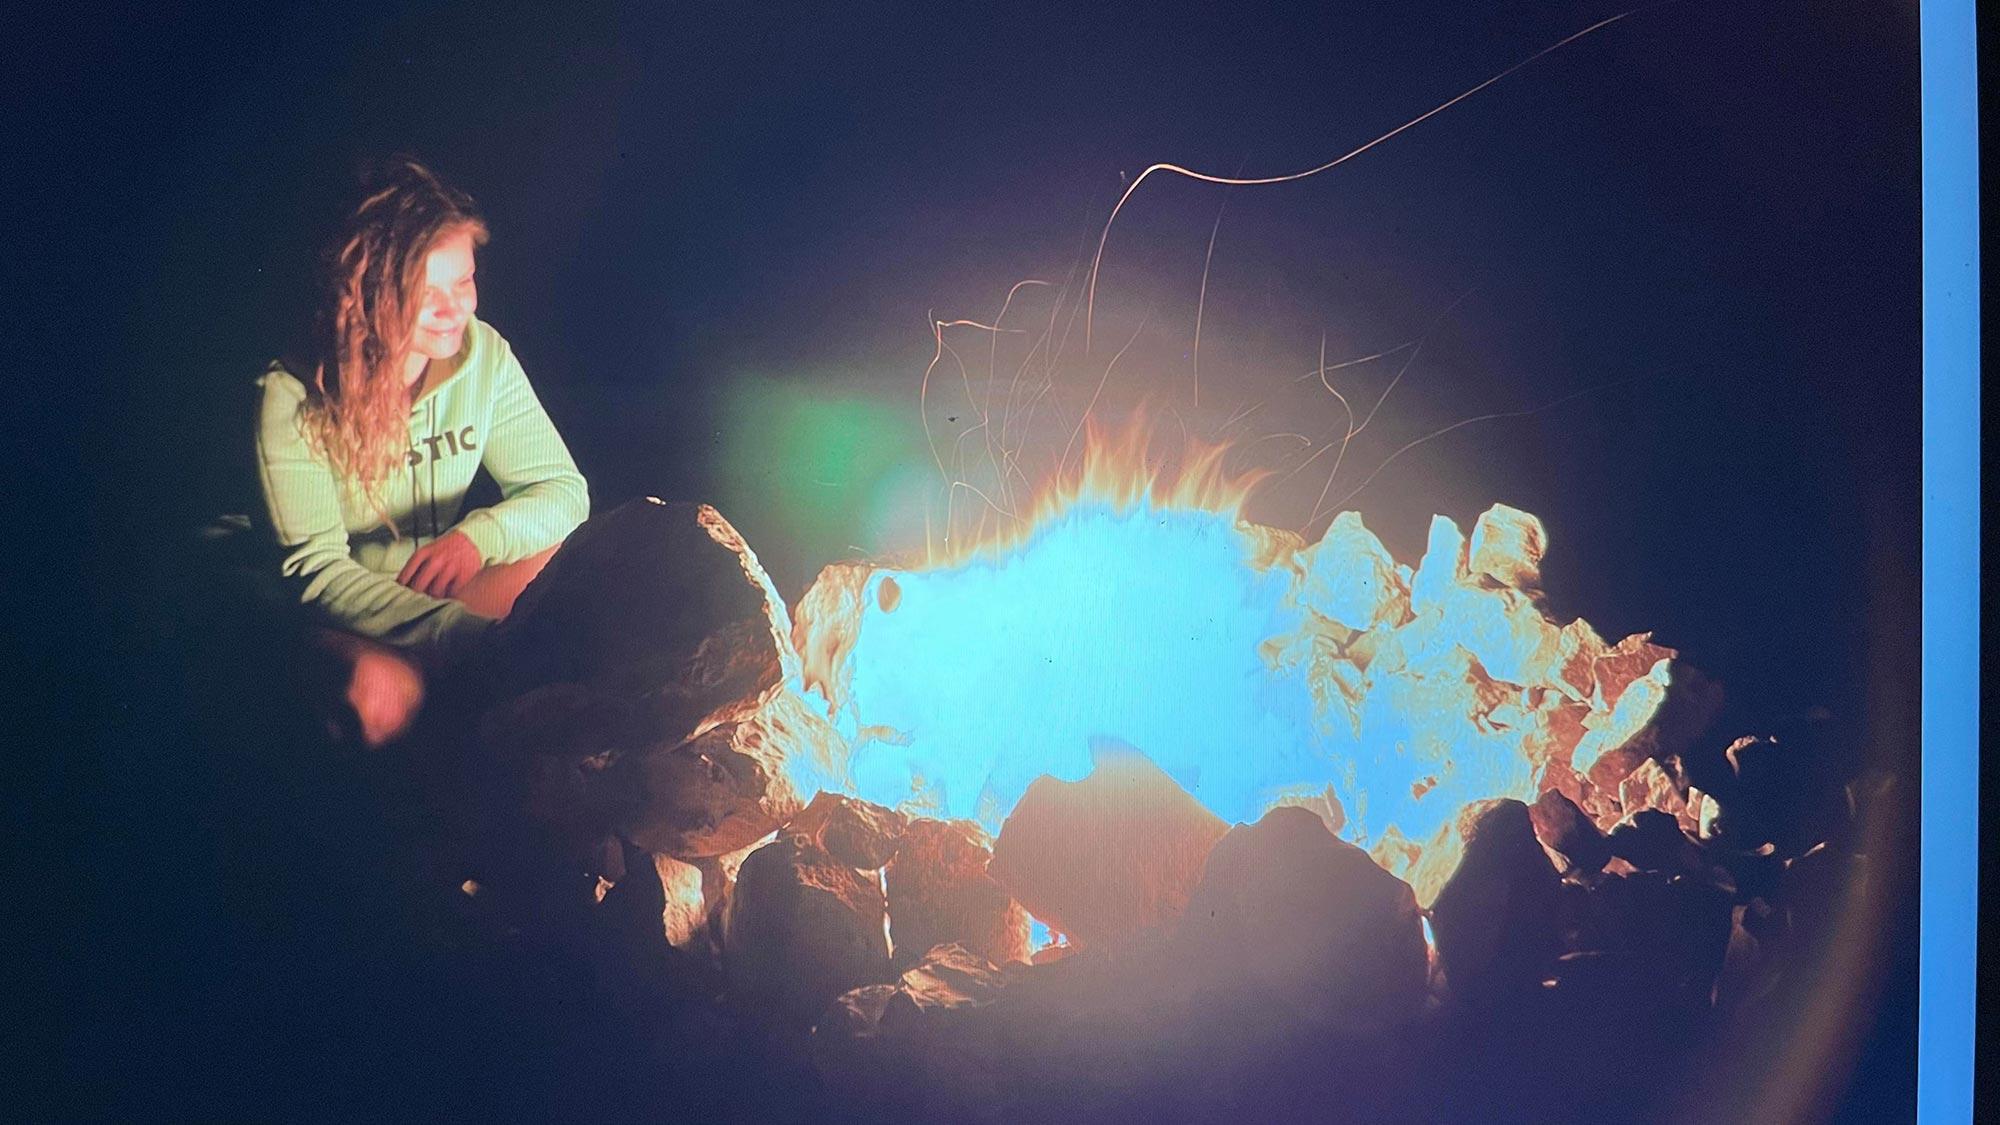 Cosy bonfire night for Justyna Sniady in Australia